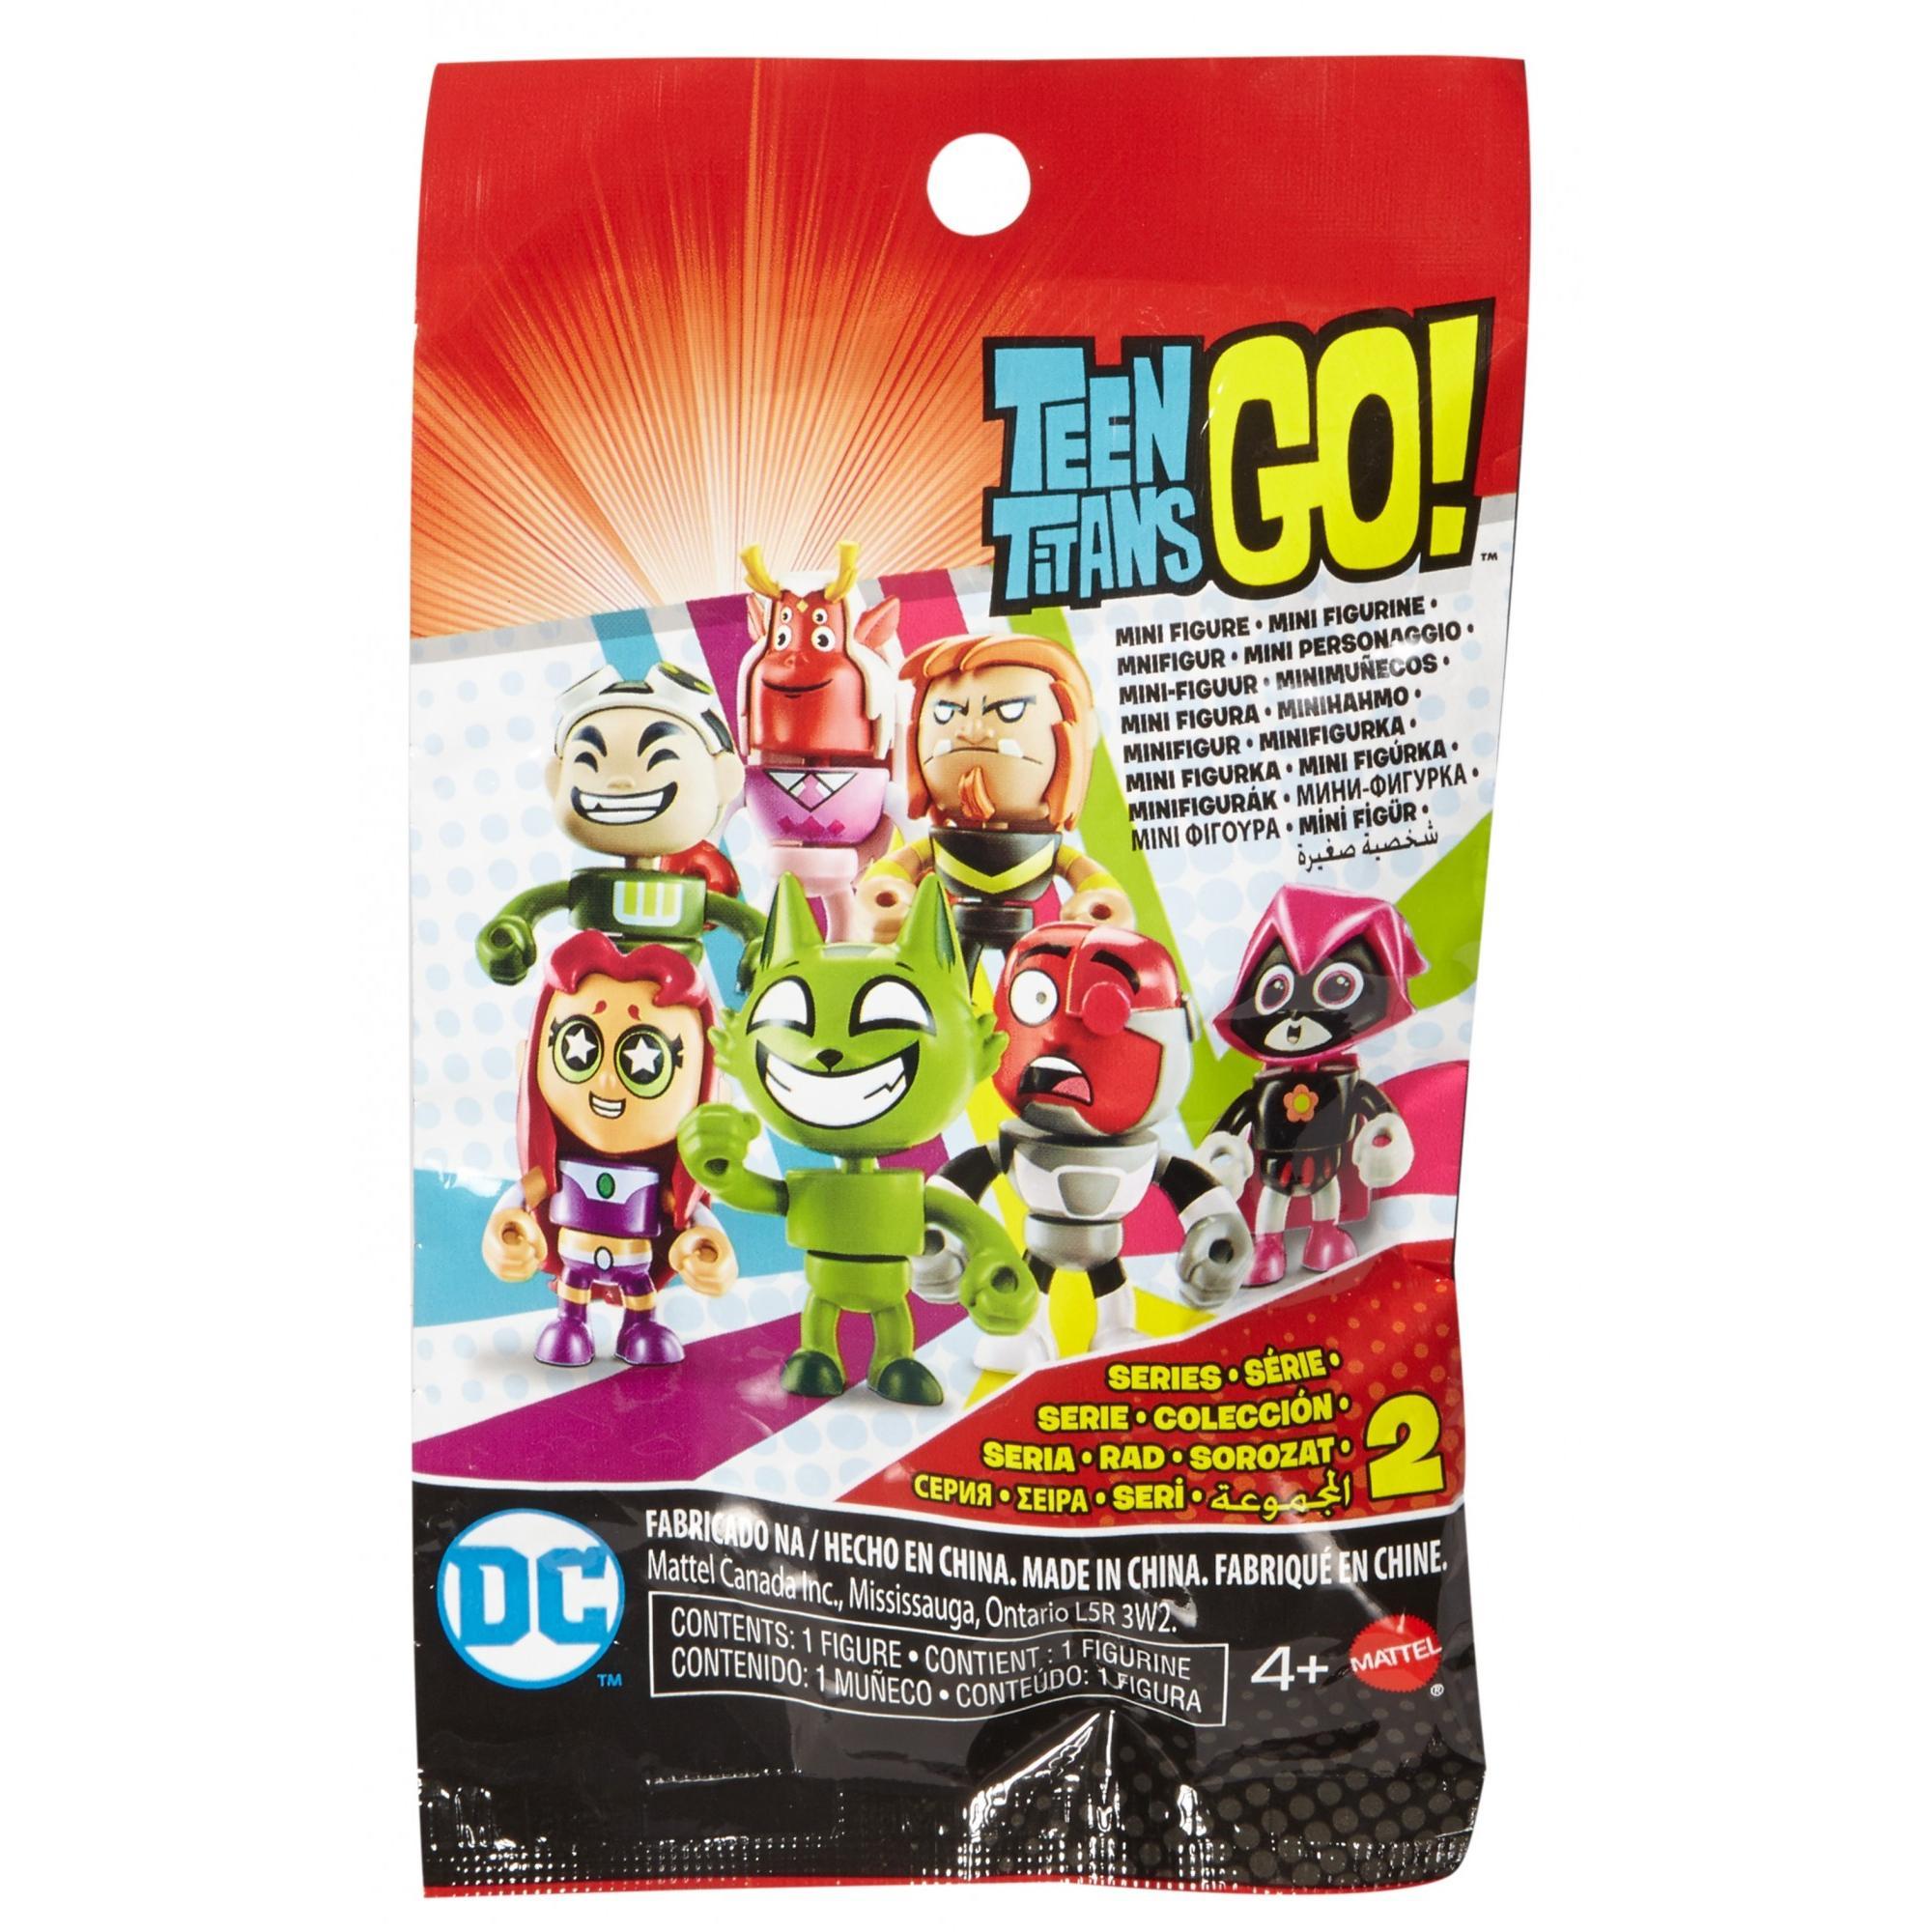 Teen Titans Go! Mini Figure Blind Bag (Styles May Vary)